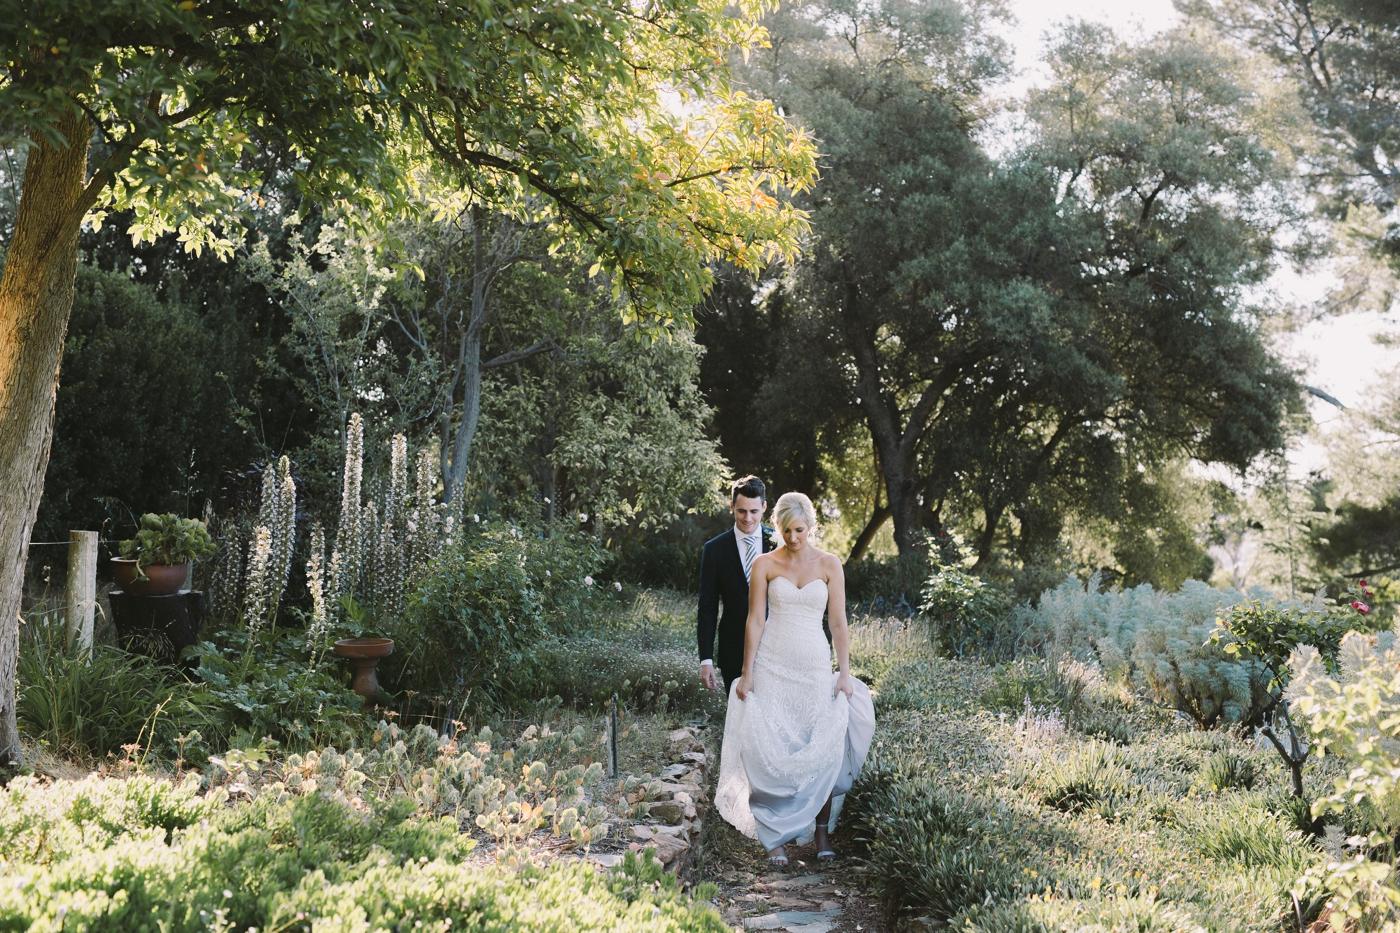 Lauren & Max - Marybank Estate Wedding - Natural wedding photographer in Adelaide - www.katherineschultzphotography.com 84